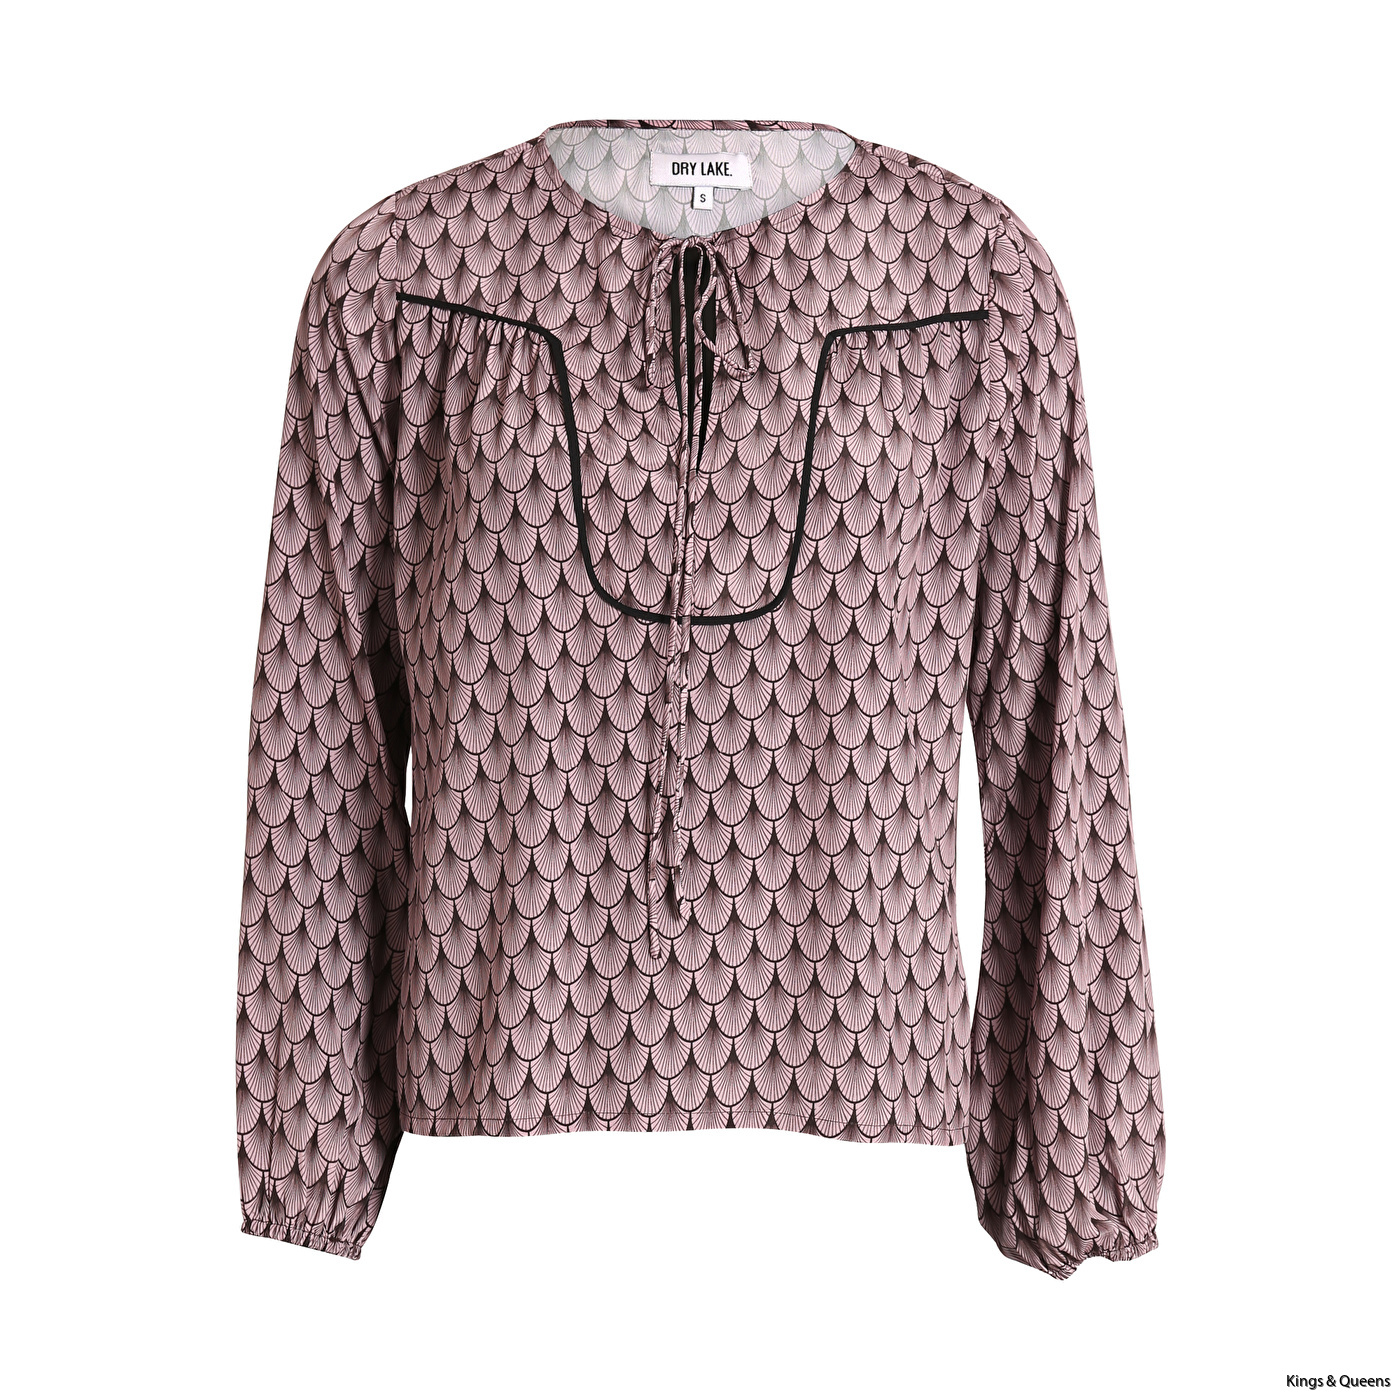 03 DL-17-07-05 Shadowy blouse